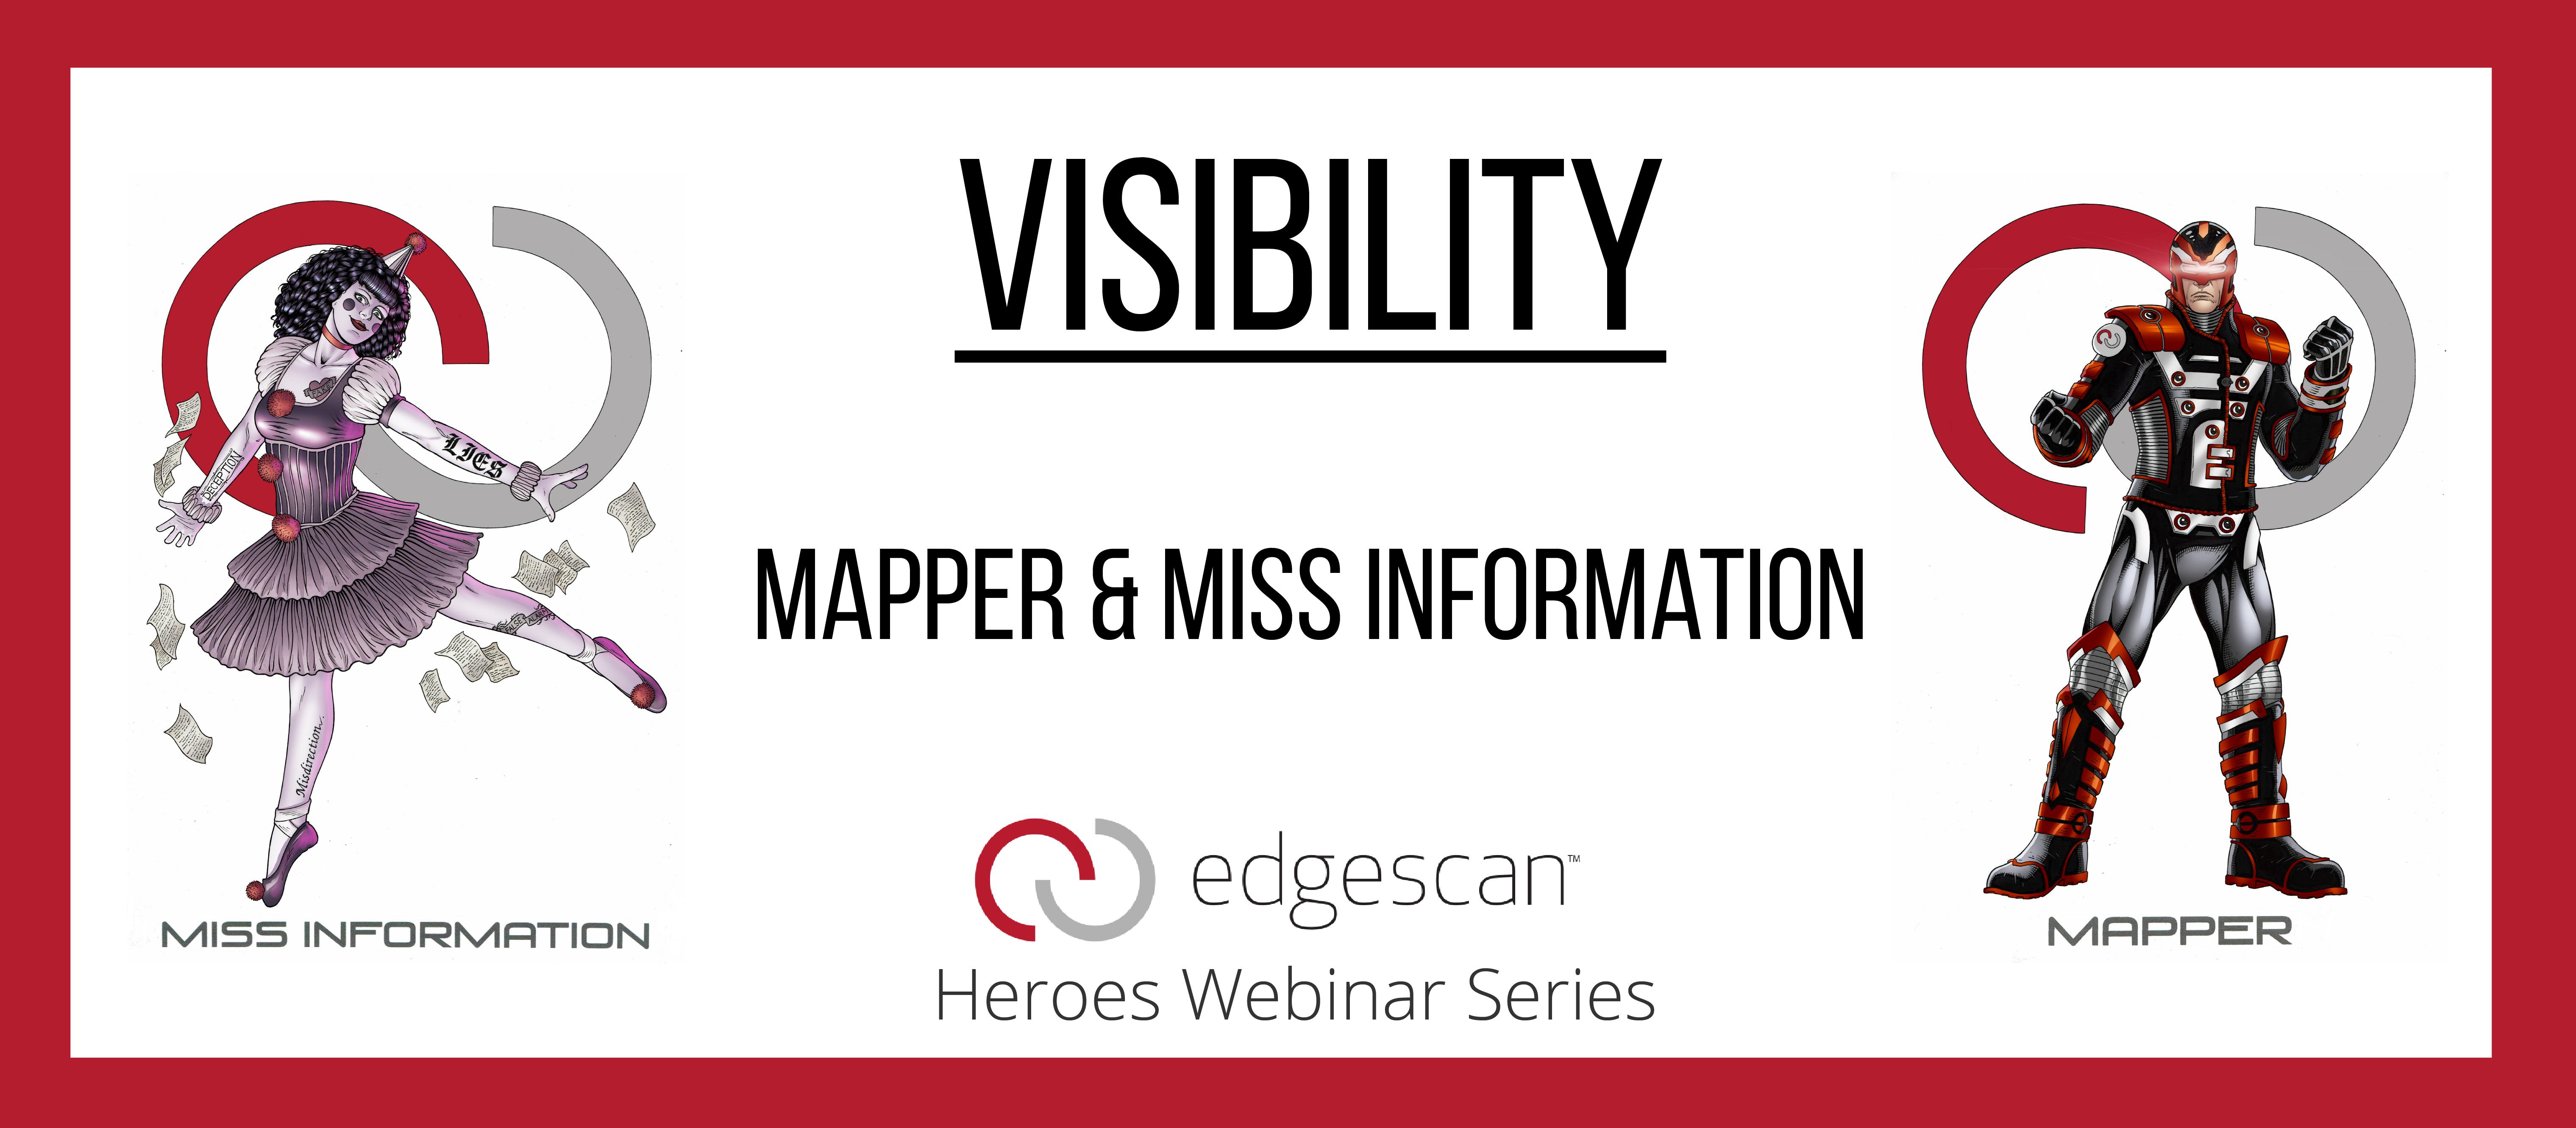 Edgescan Webinar – Fullstack Vulnerability Management – VISIBILITY – Heroes & Villains